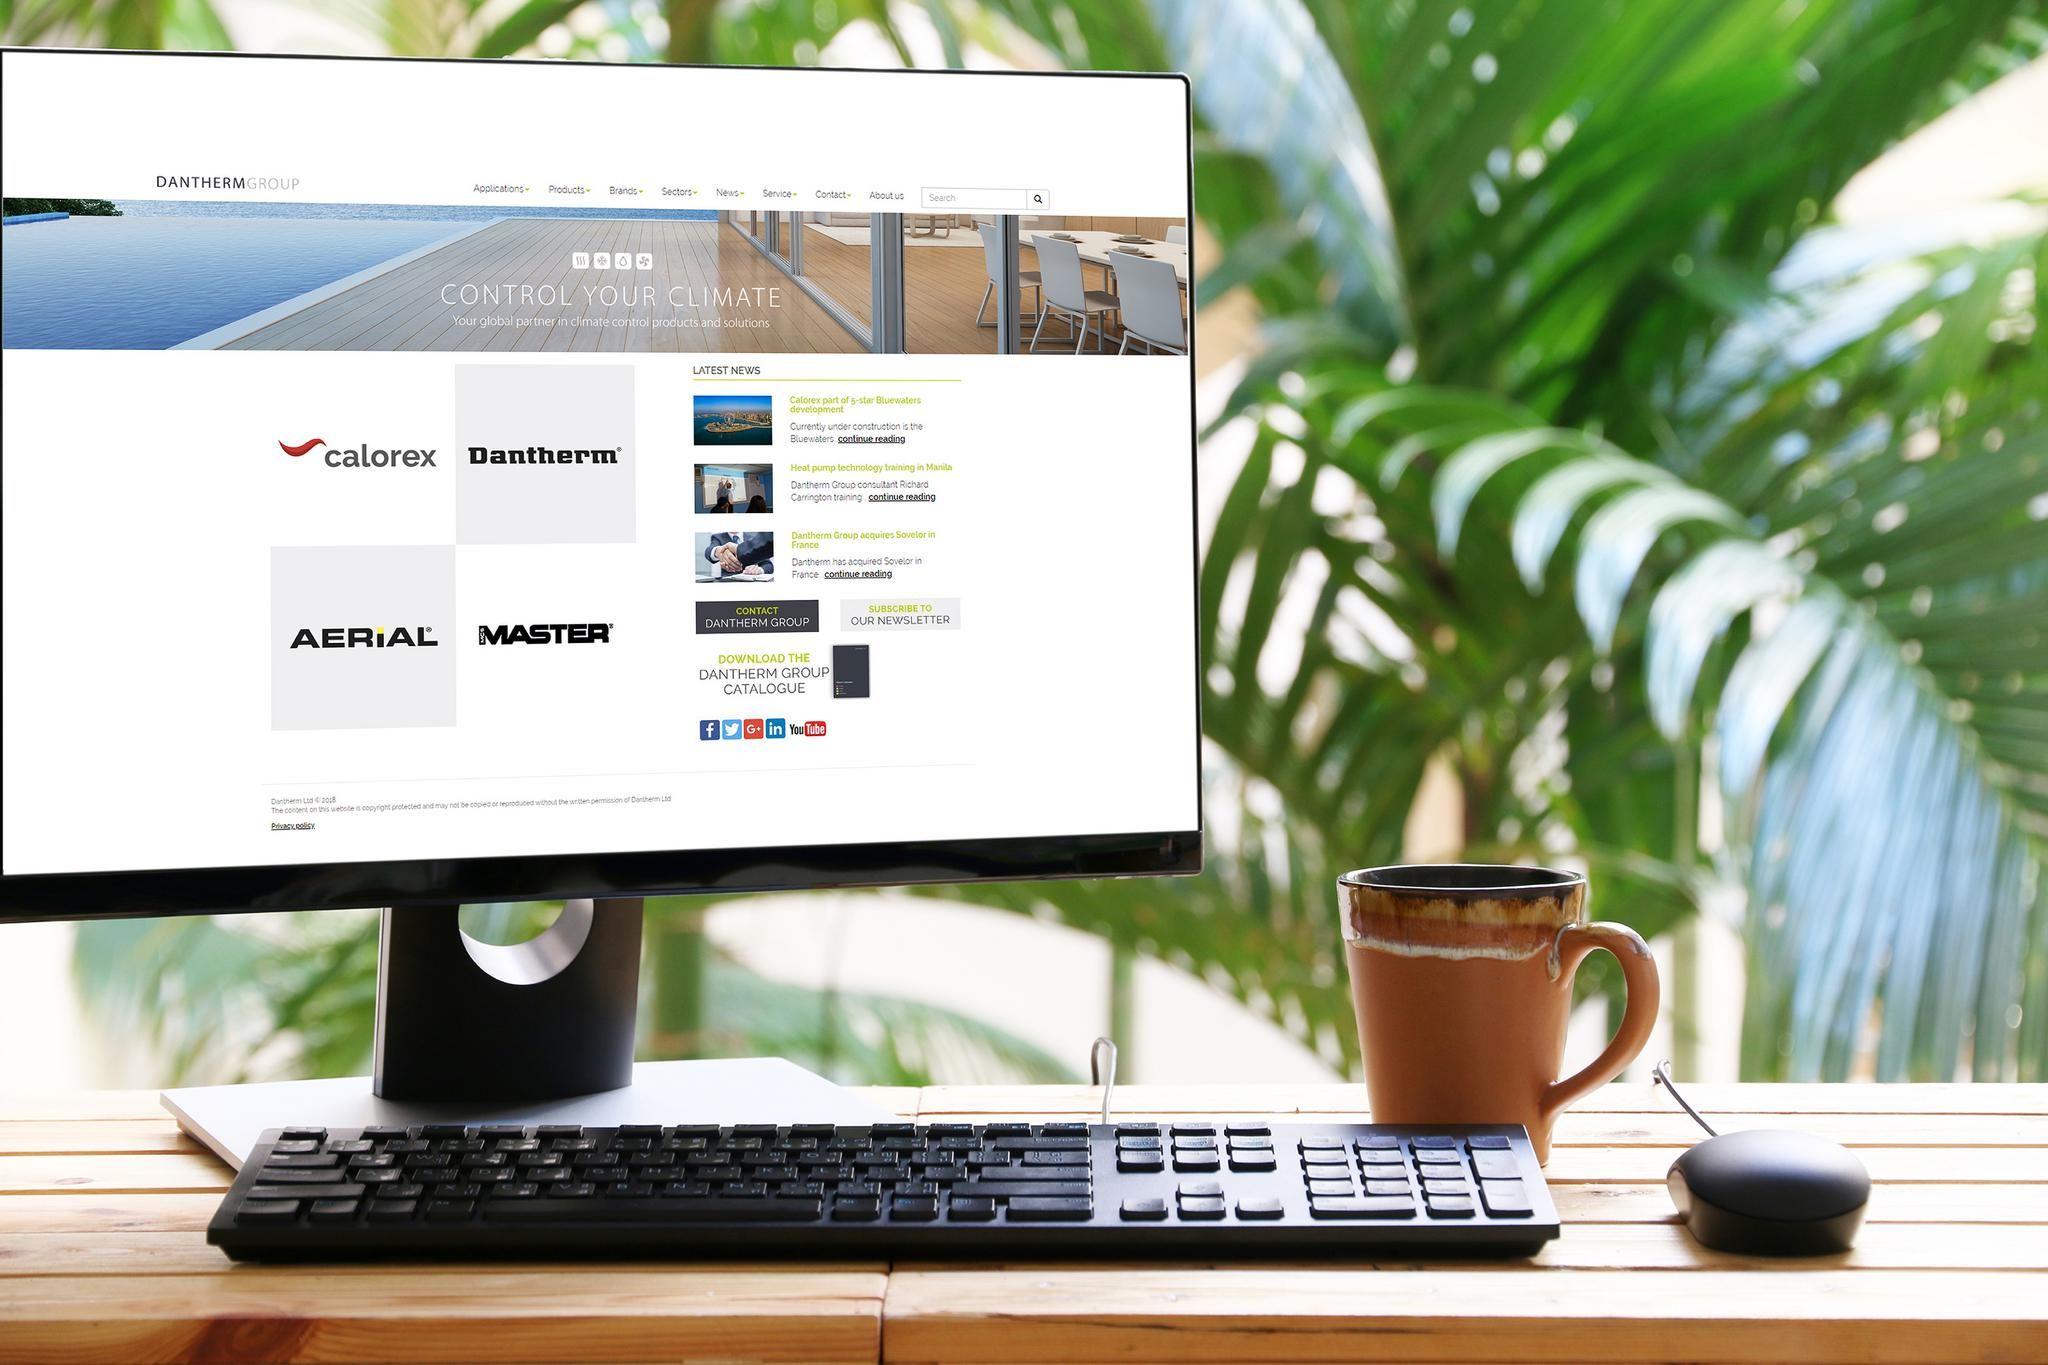 Calorex website becomes danthermgroup.co.uk